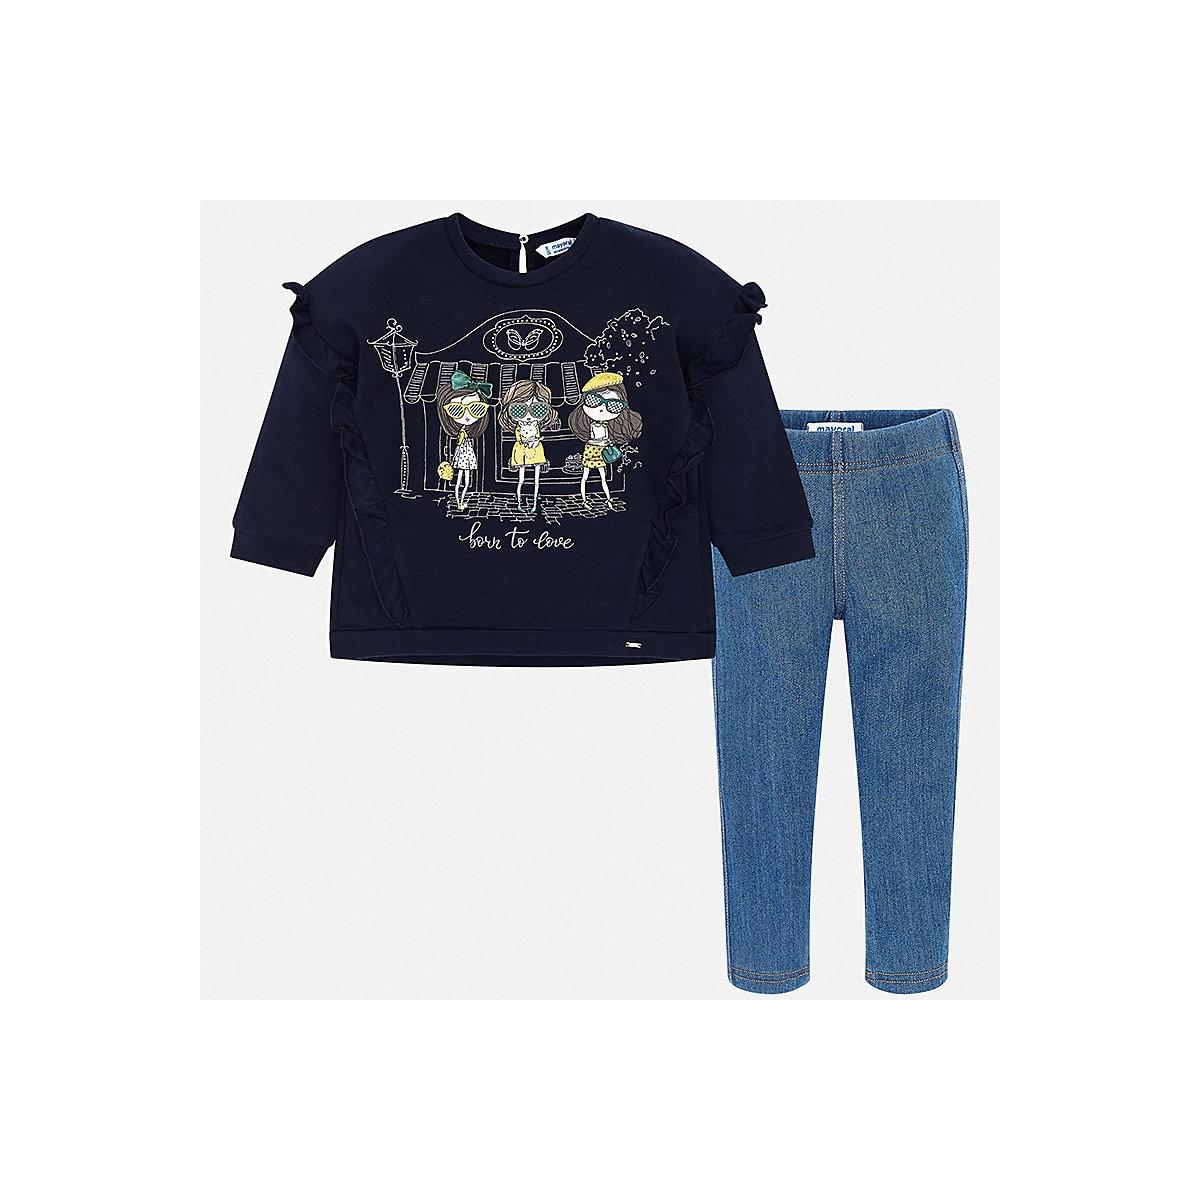 MAYORAL Children's Sets 8848783 Cotton Girls Fashion clothing costume for girl leggings T-shirt